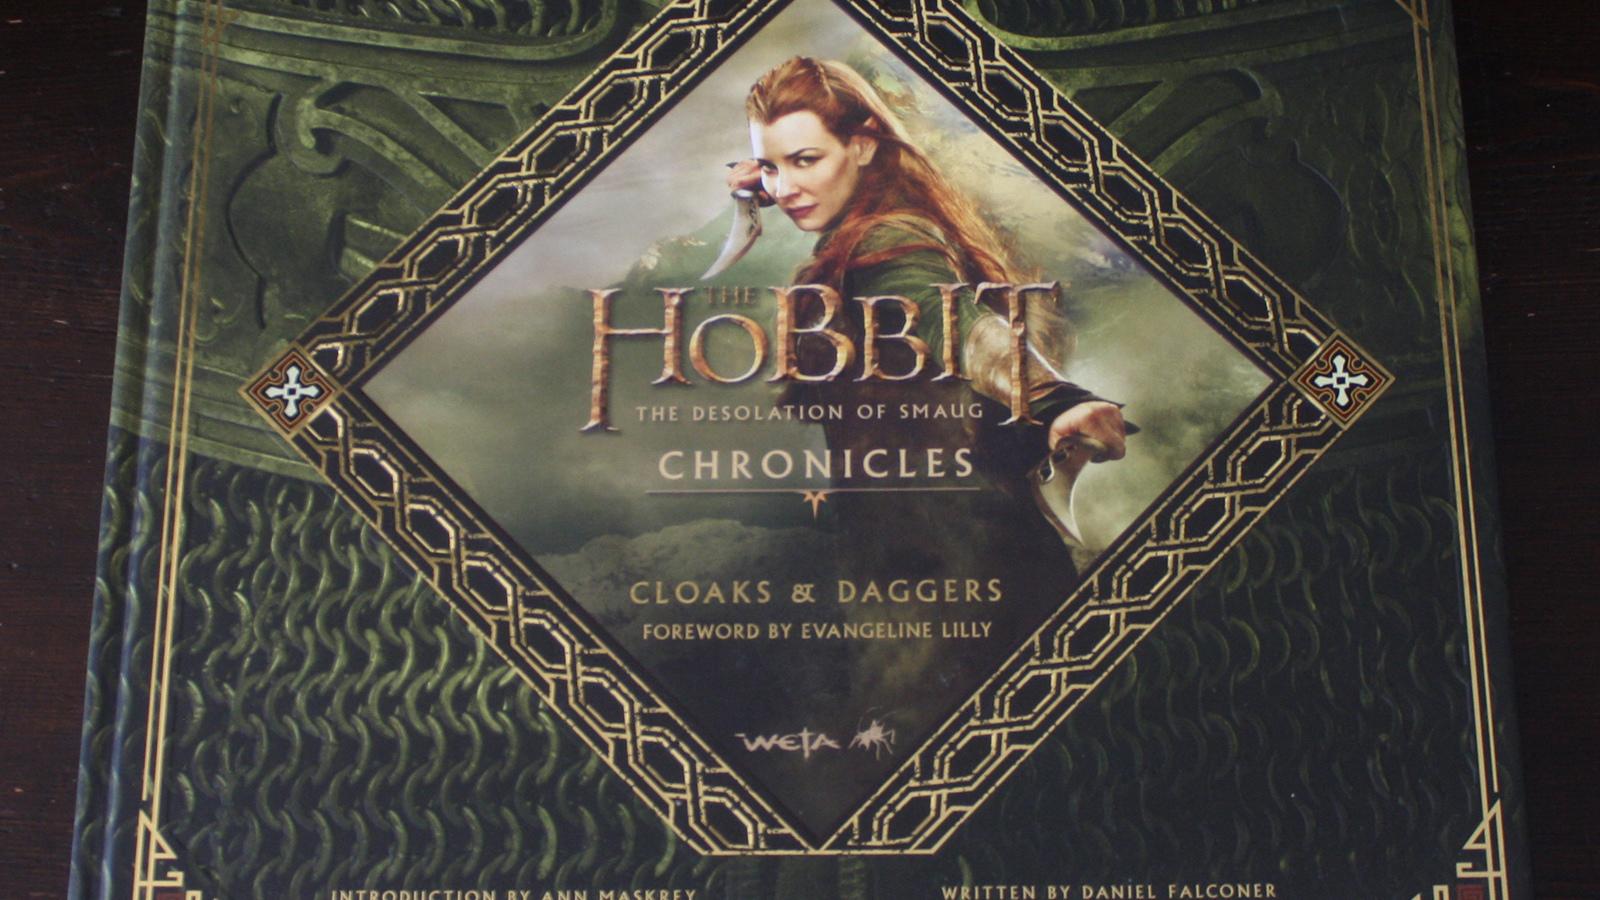 Fraai boek - The Hobbit: The Desolation of Smaug, Chronicles: Cloaks & Daggers